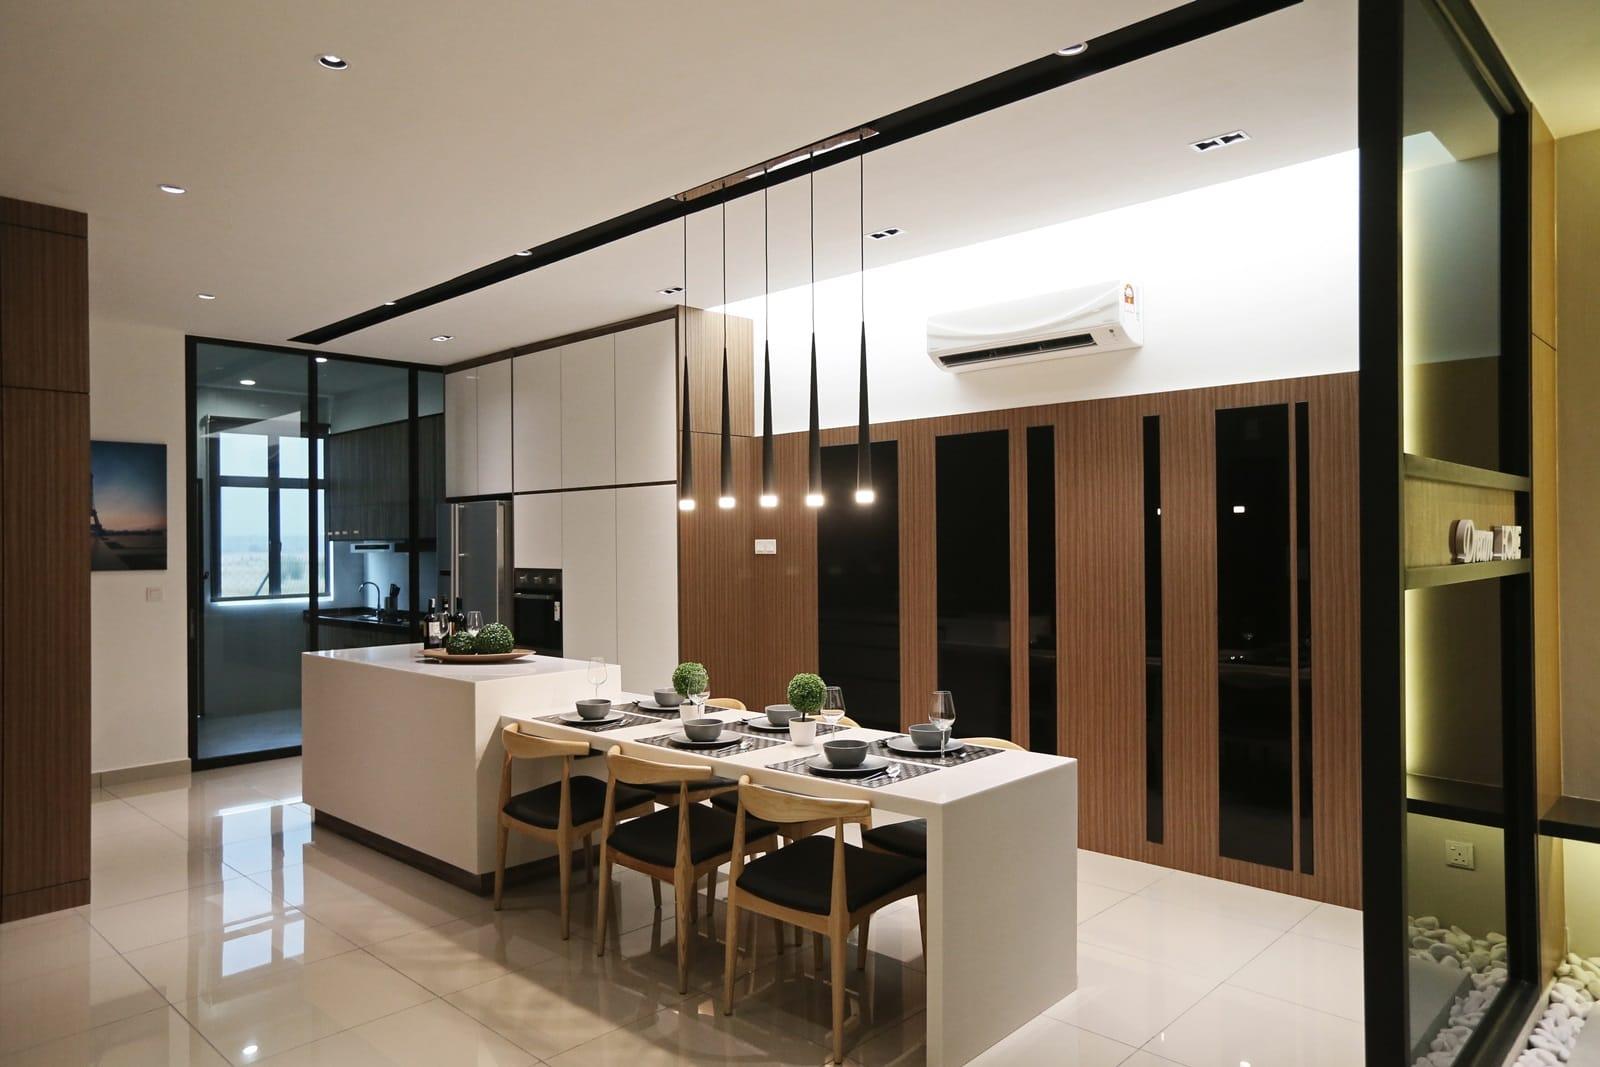 Rimbun vista show unit receives a sleek and stylish touch for Infinity kitchen designs